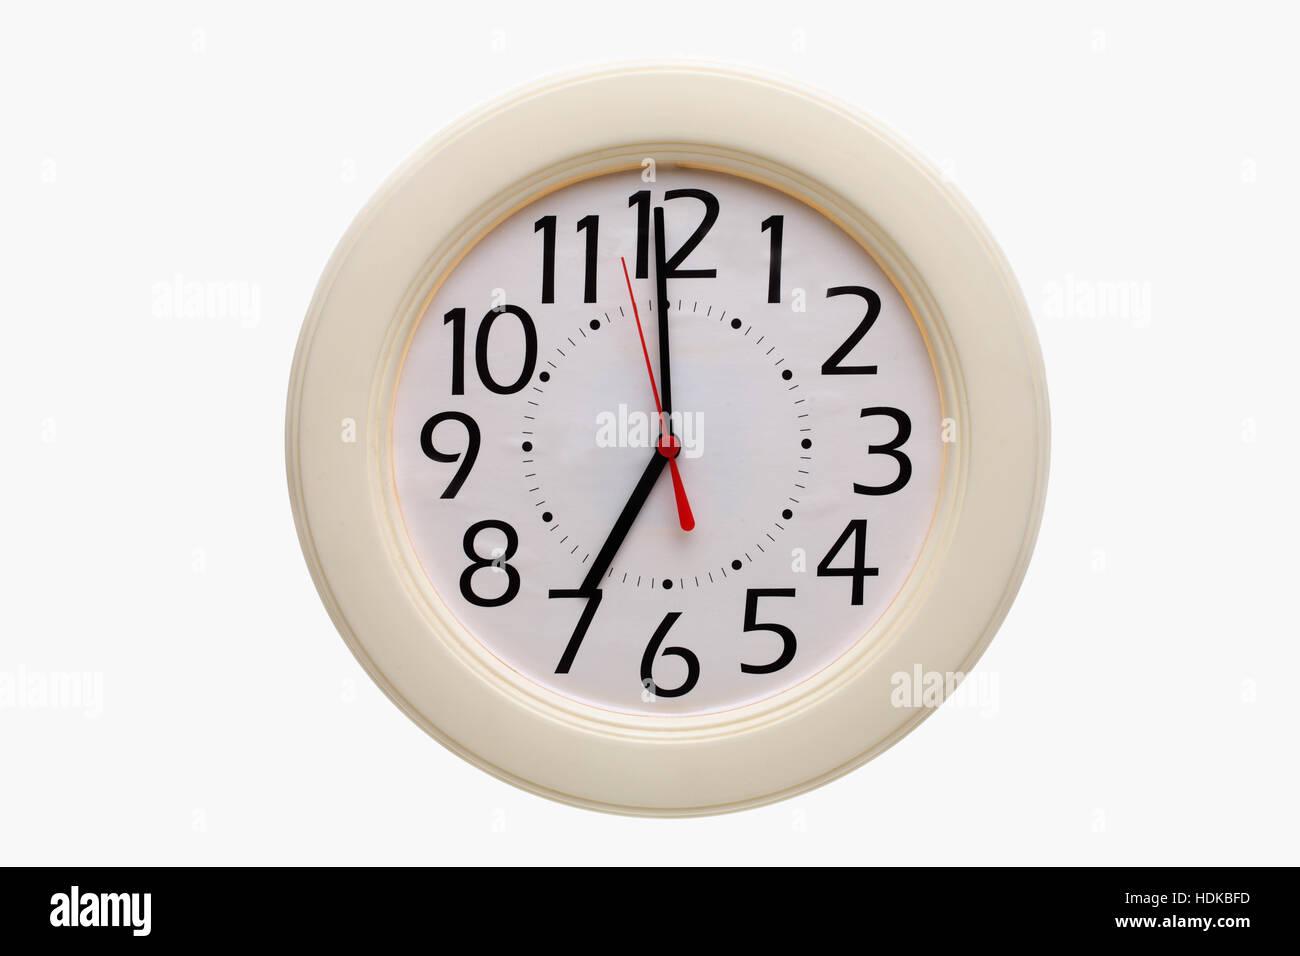 Analog wall clock 7:00 o'clock - Stock Image